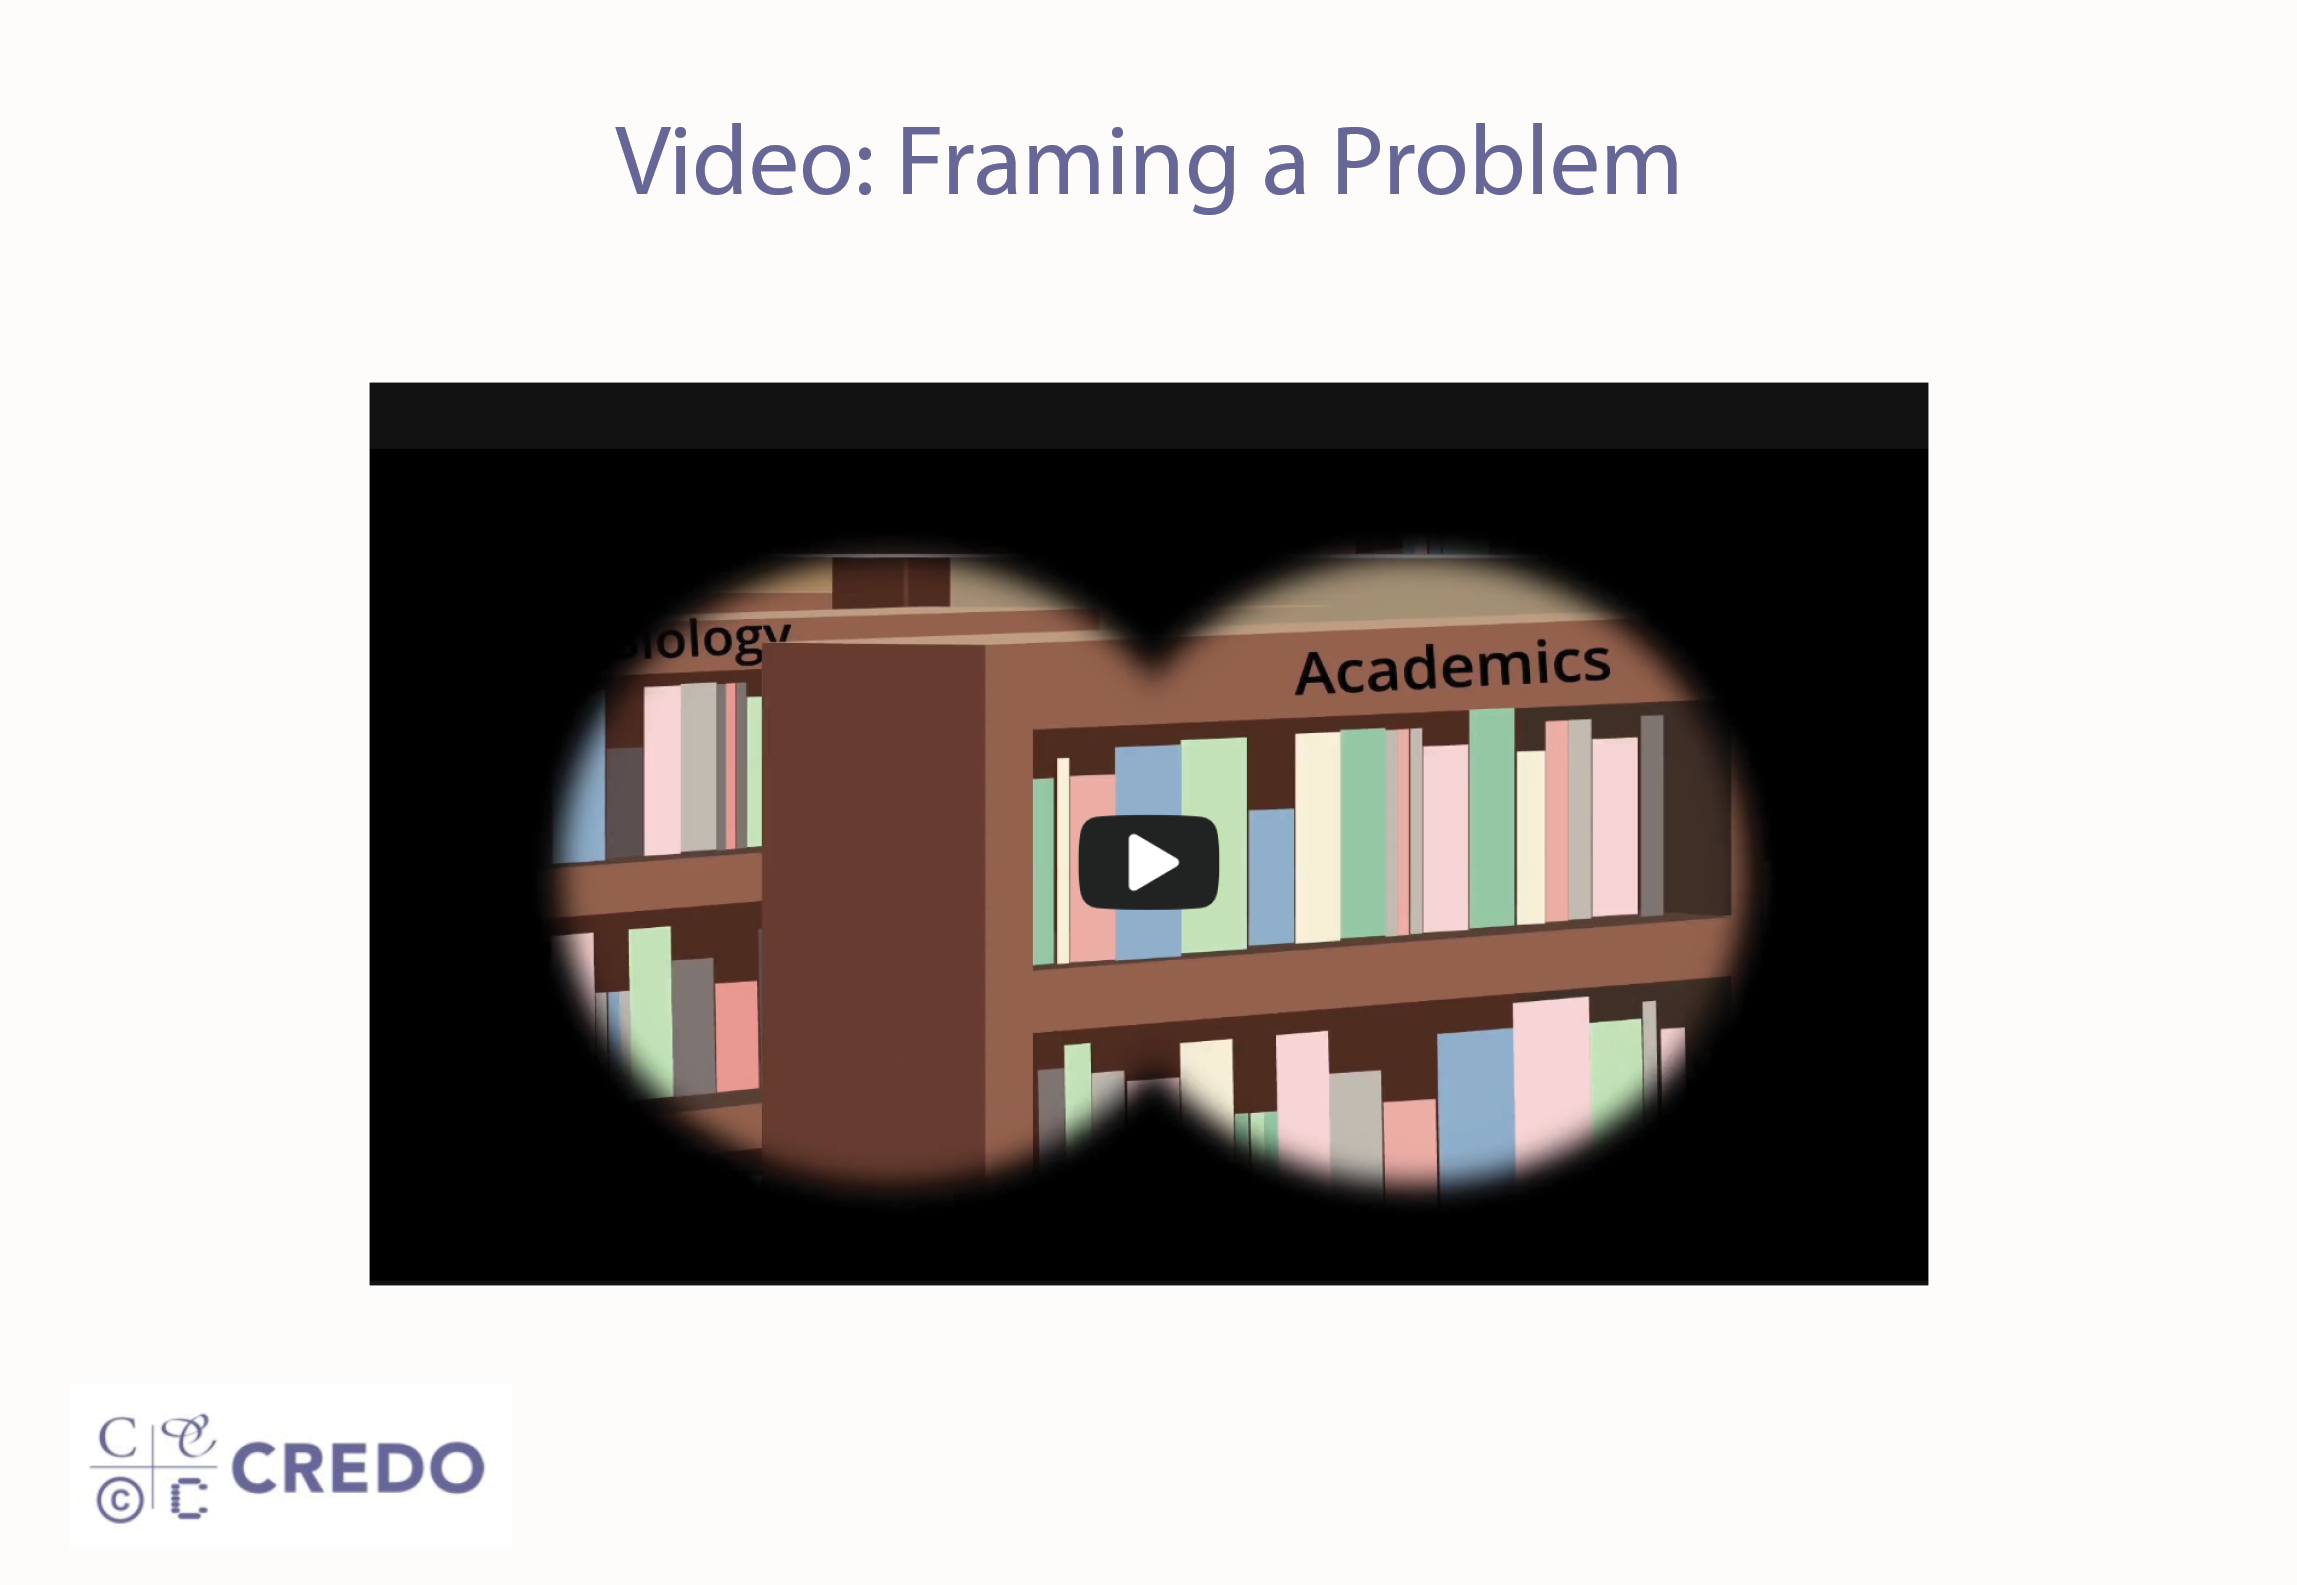 Video: Framing a Problem Video